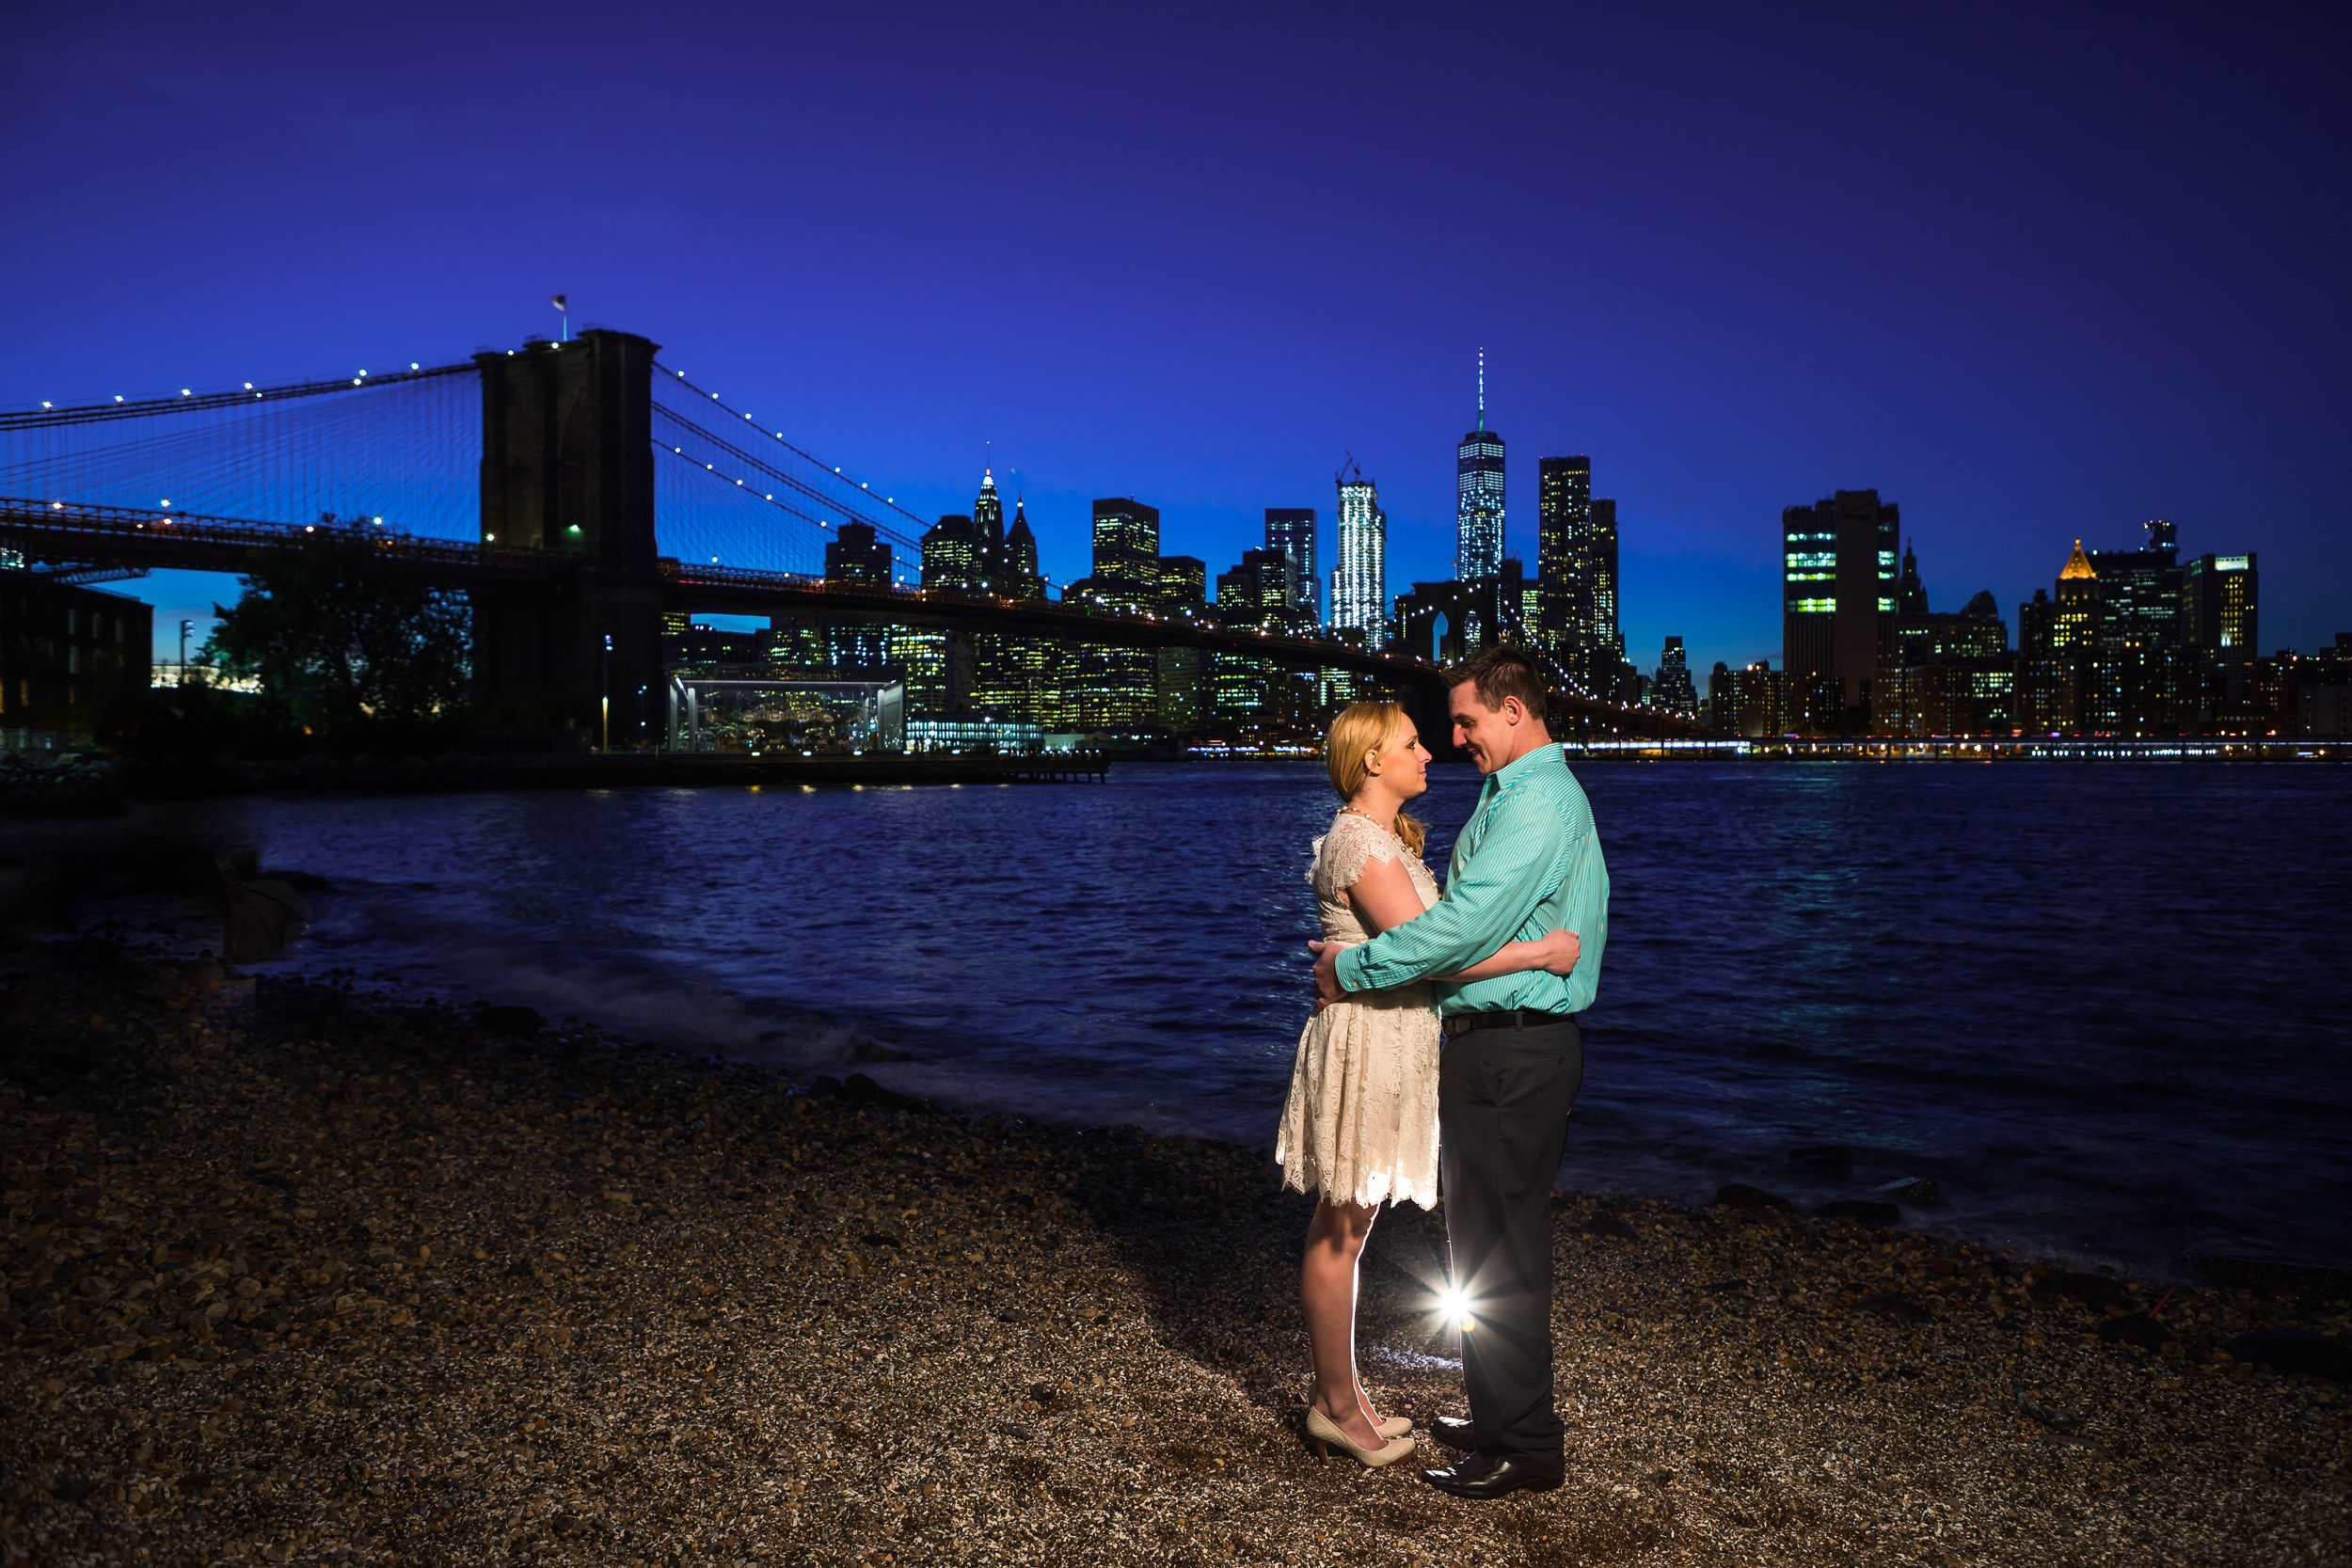 Brooklyn Bridge Engagement Photographer in DUMBO